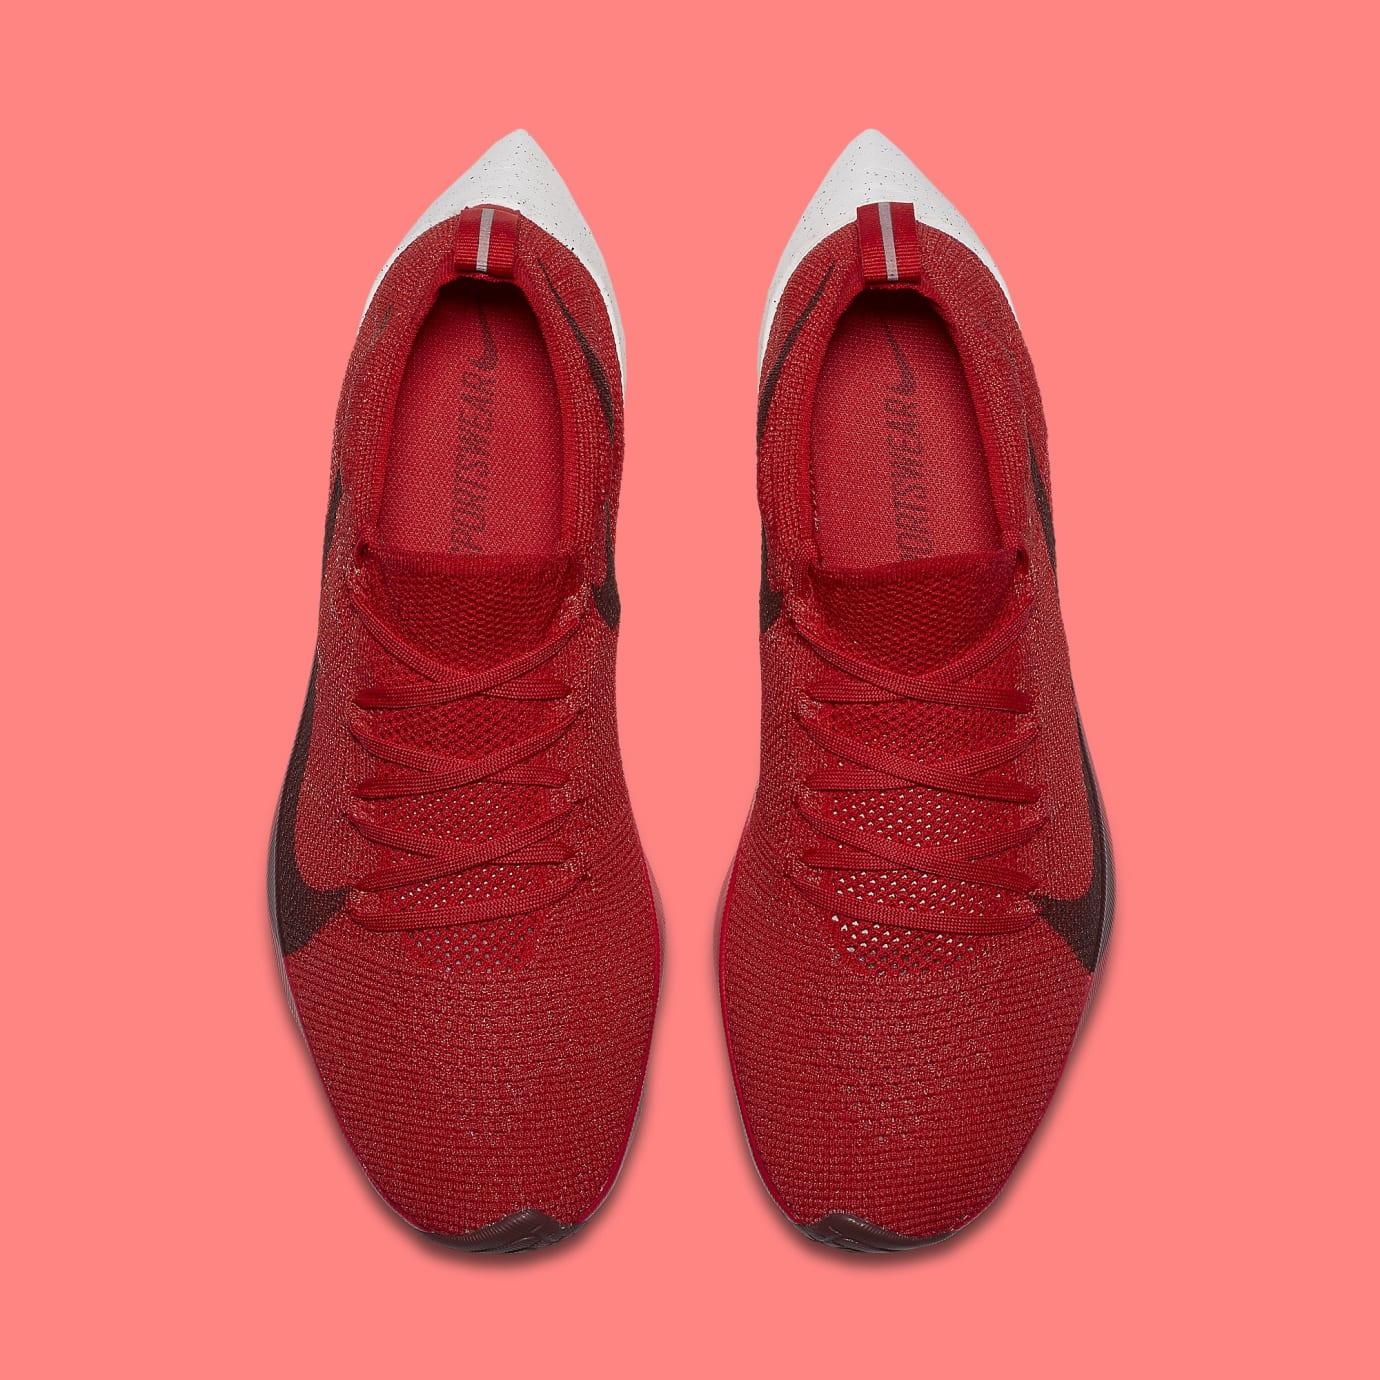 Nike Vapor Street Flyknit 'Red' AQ1763-600 (Top)